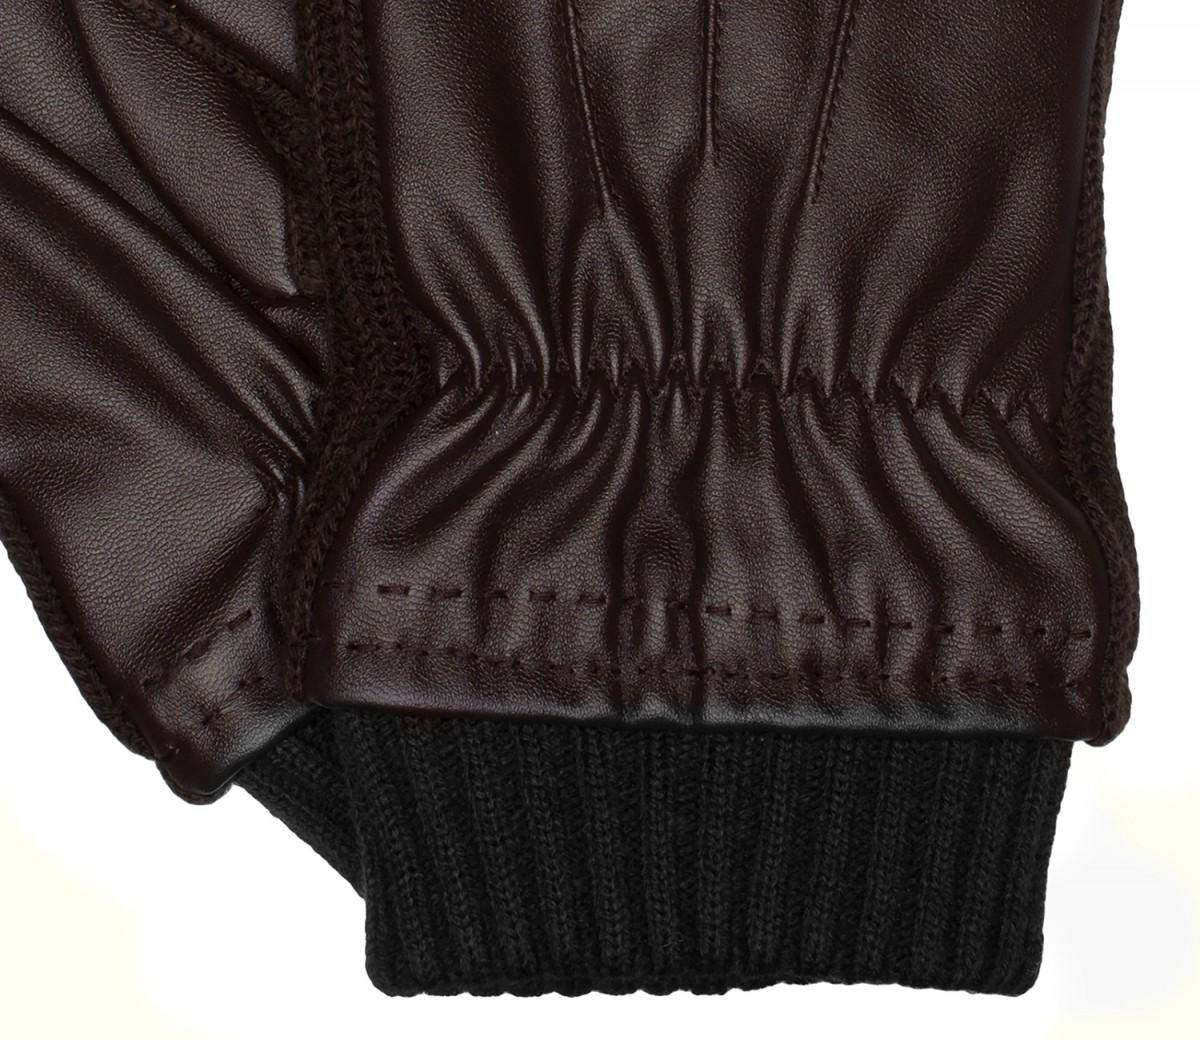 handschuhe herrenhandschuhe lederimitat braun 3361. Black Bedroom Furniture Sets. Home Design Ideas